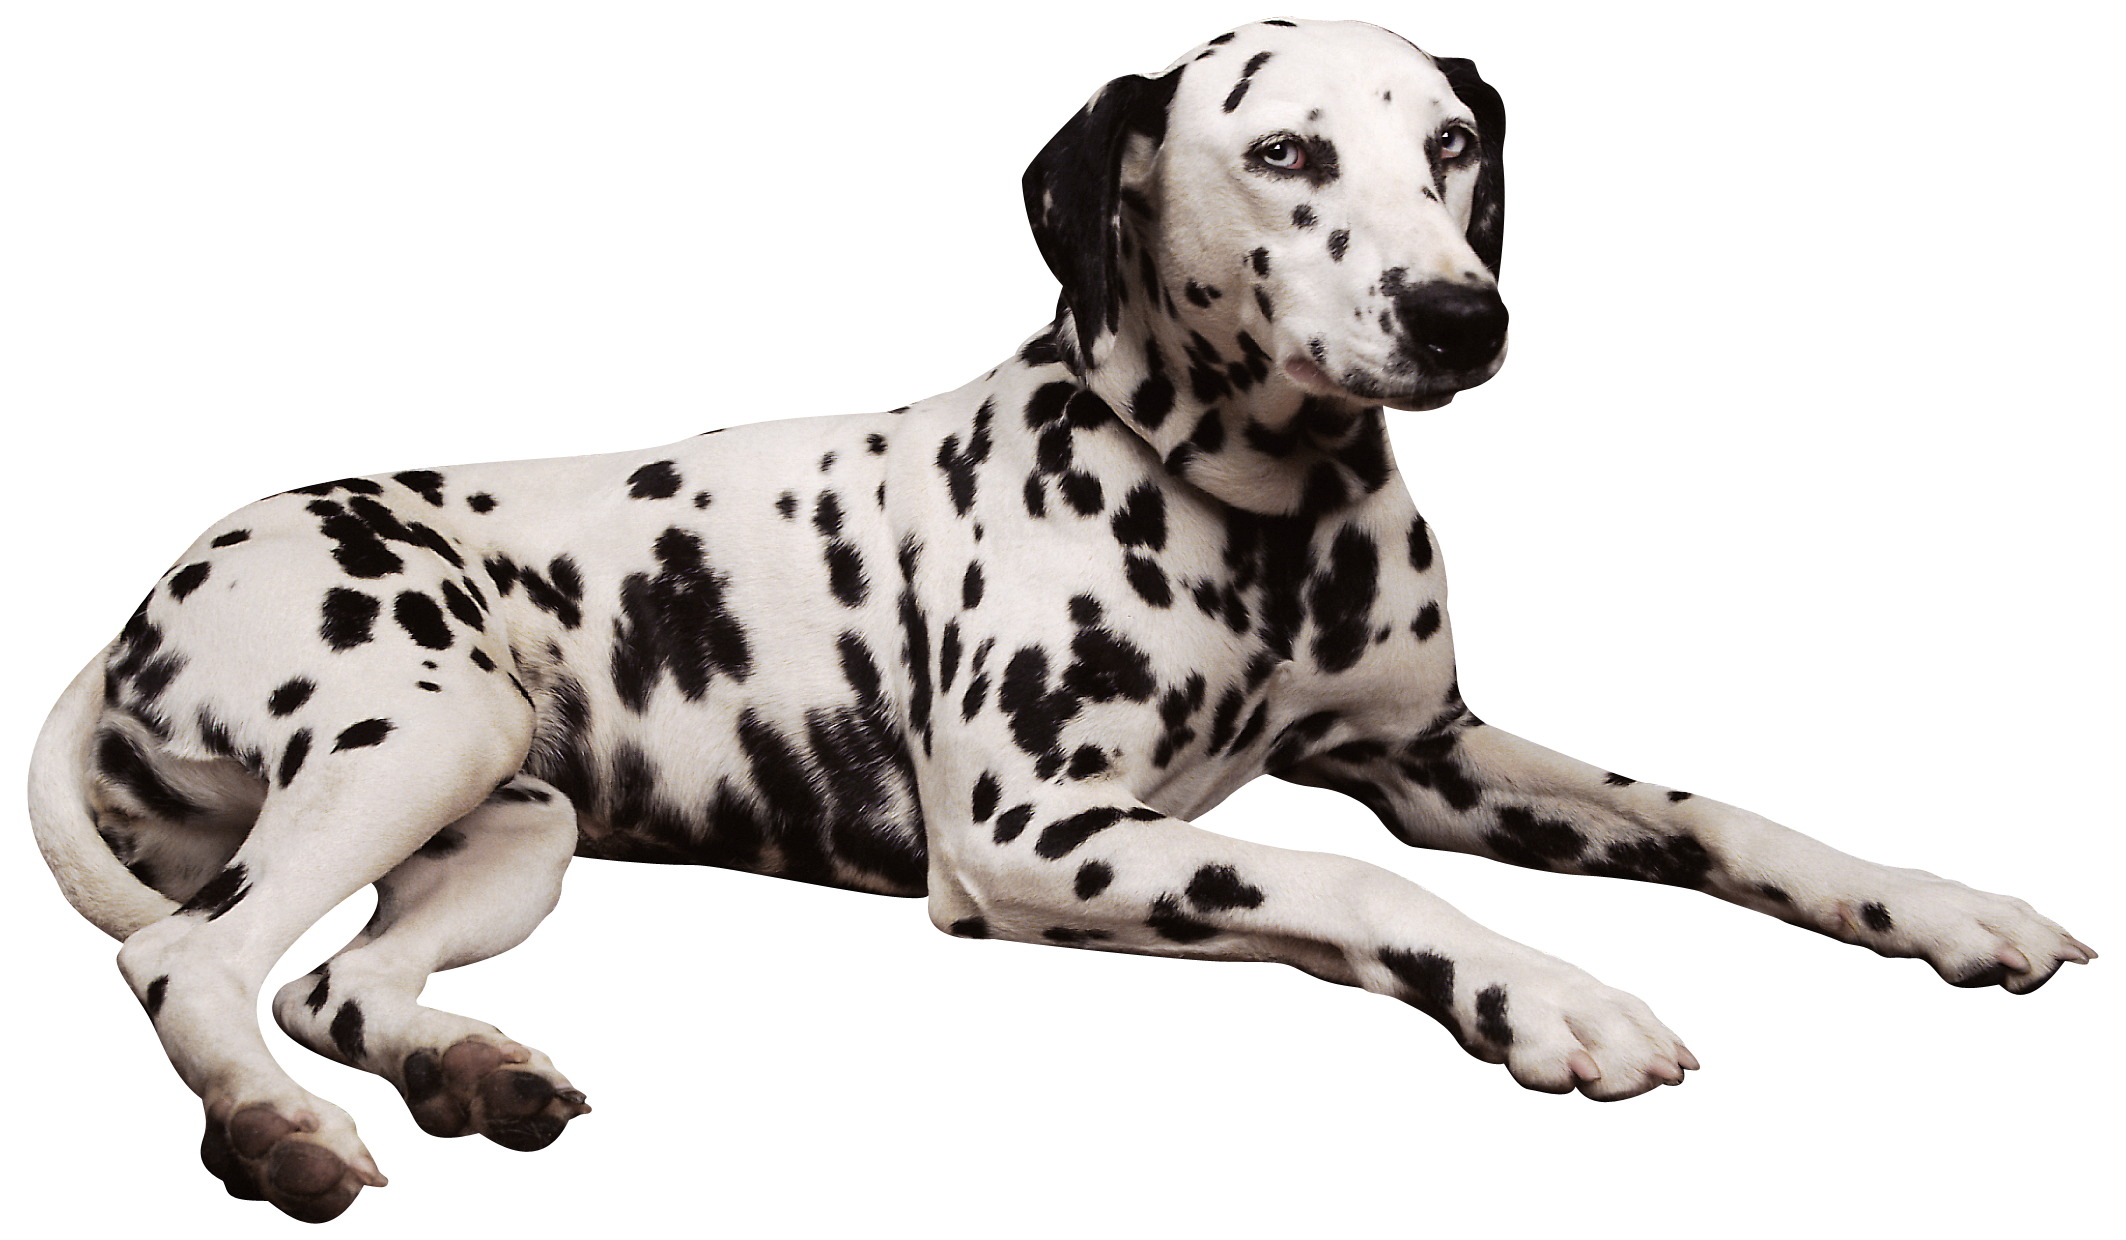 Pawprint clipart dalmatian. Png best web